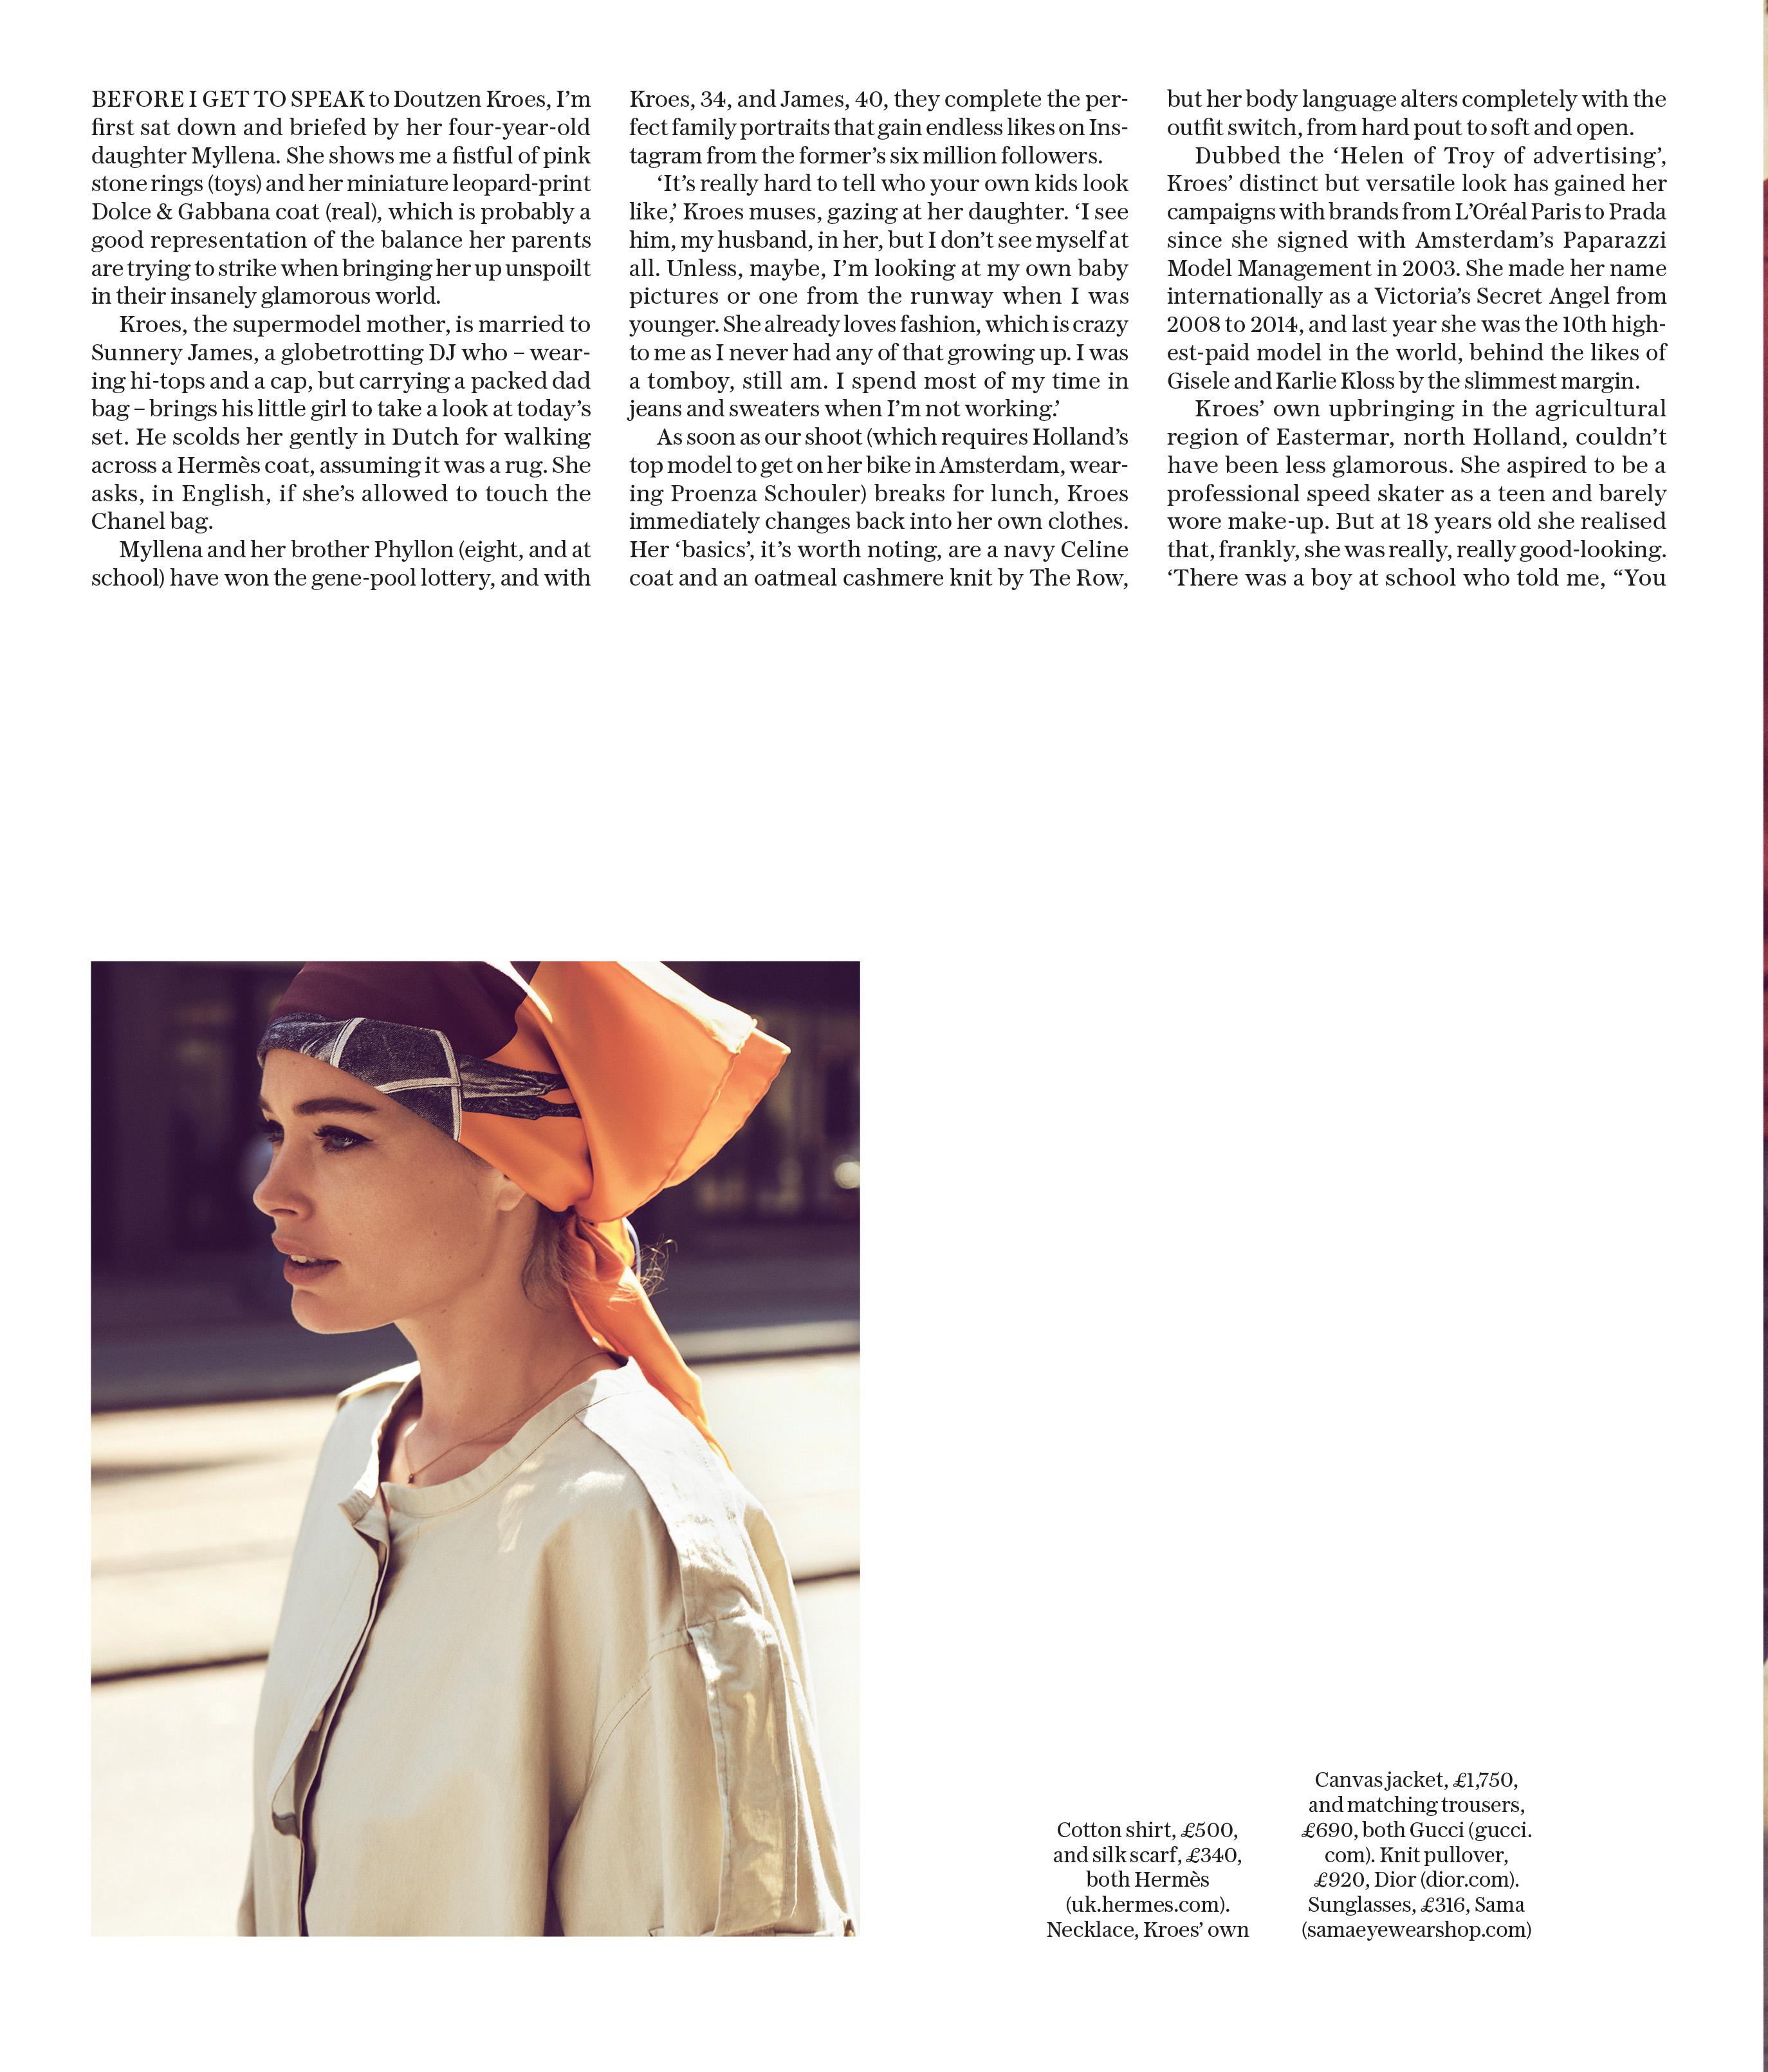 DOUTZEN1Daily Telegraph Magazine_29-06-2019_Main_1st_p16